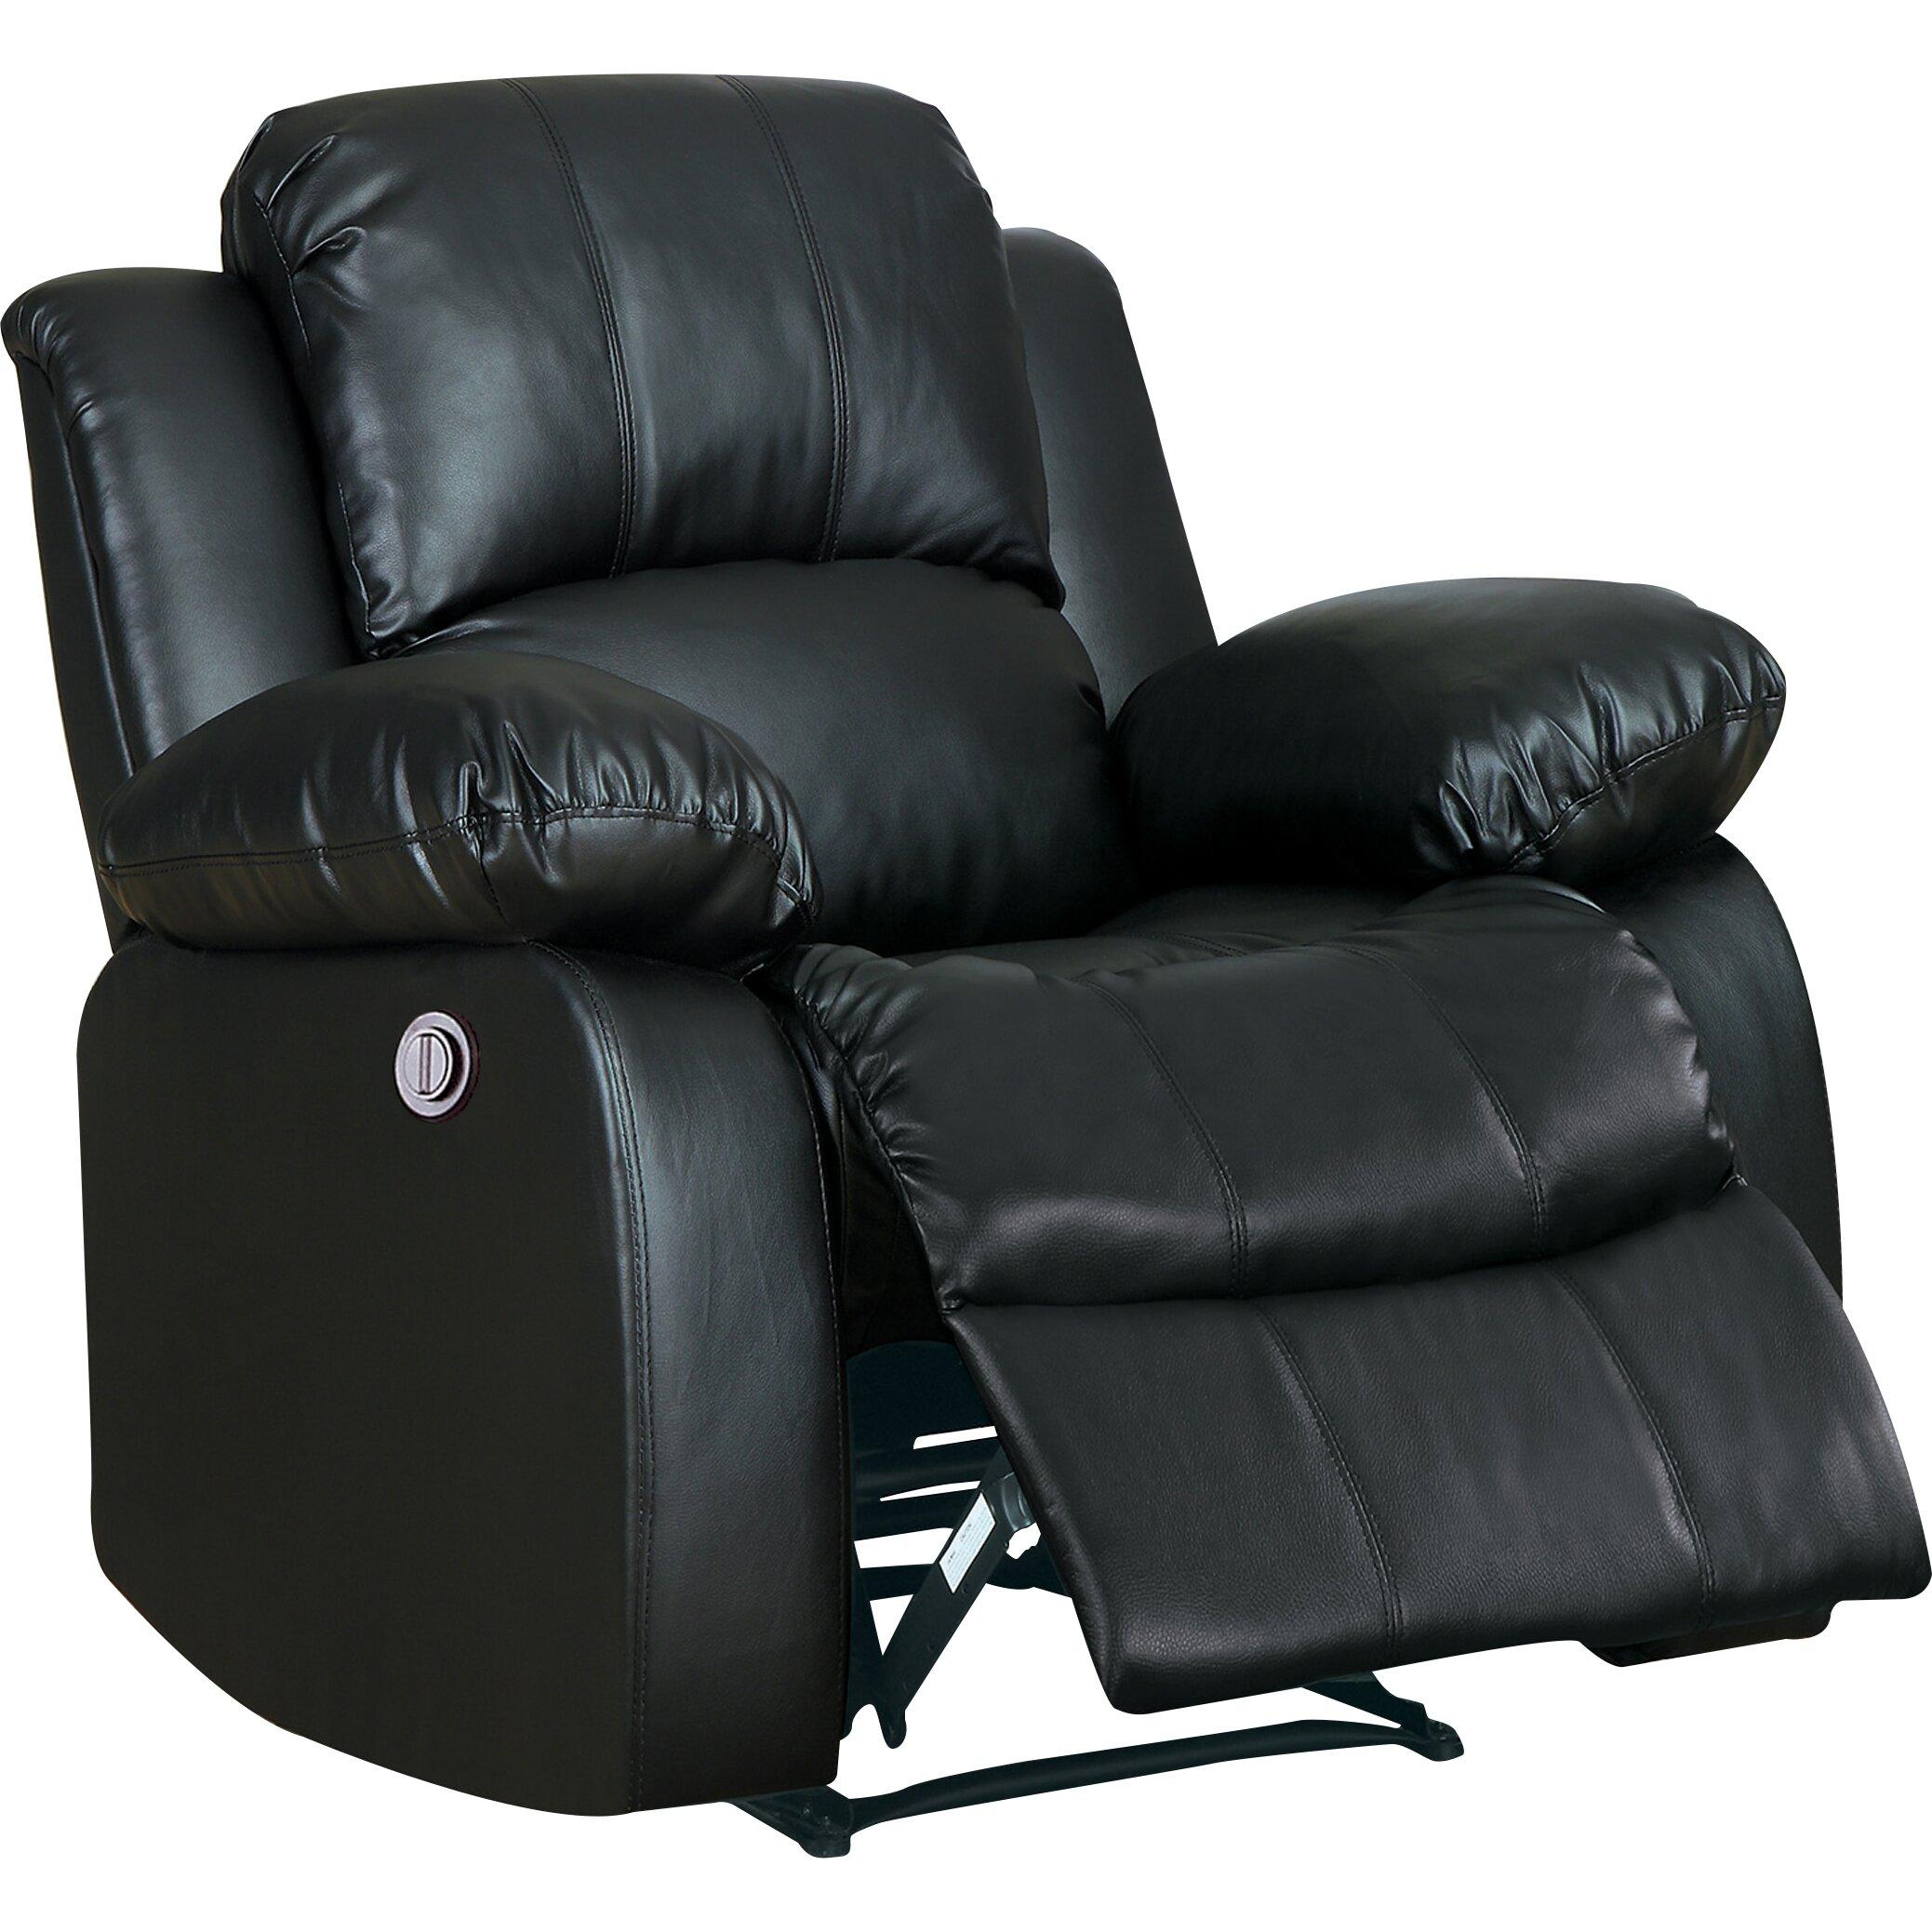 Andover mills aldreda power recliner reviews wayfair for Electric recliners reviews